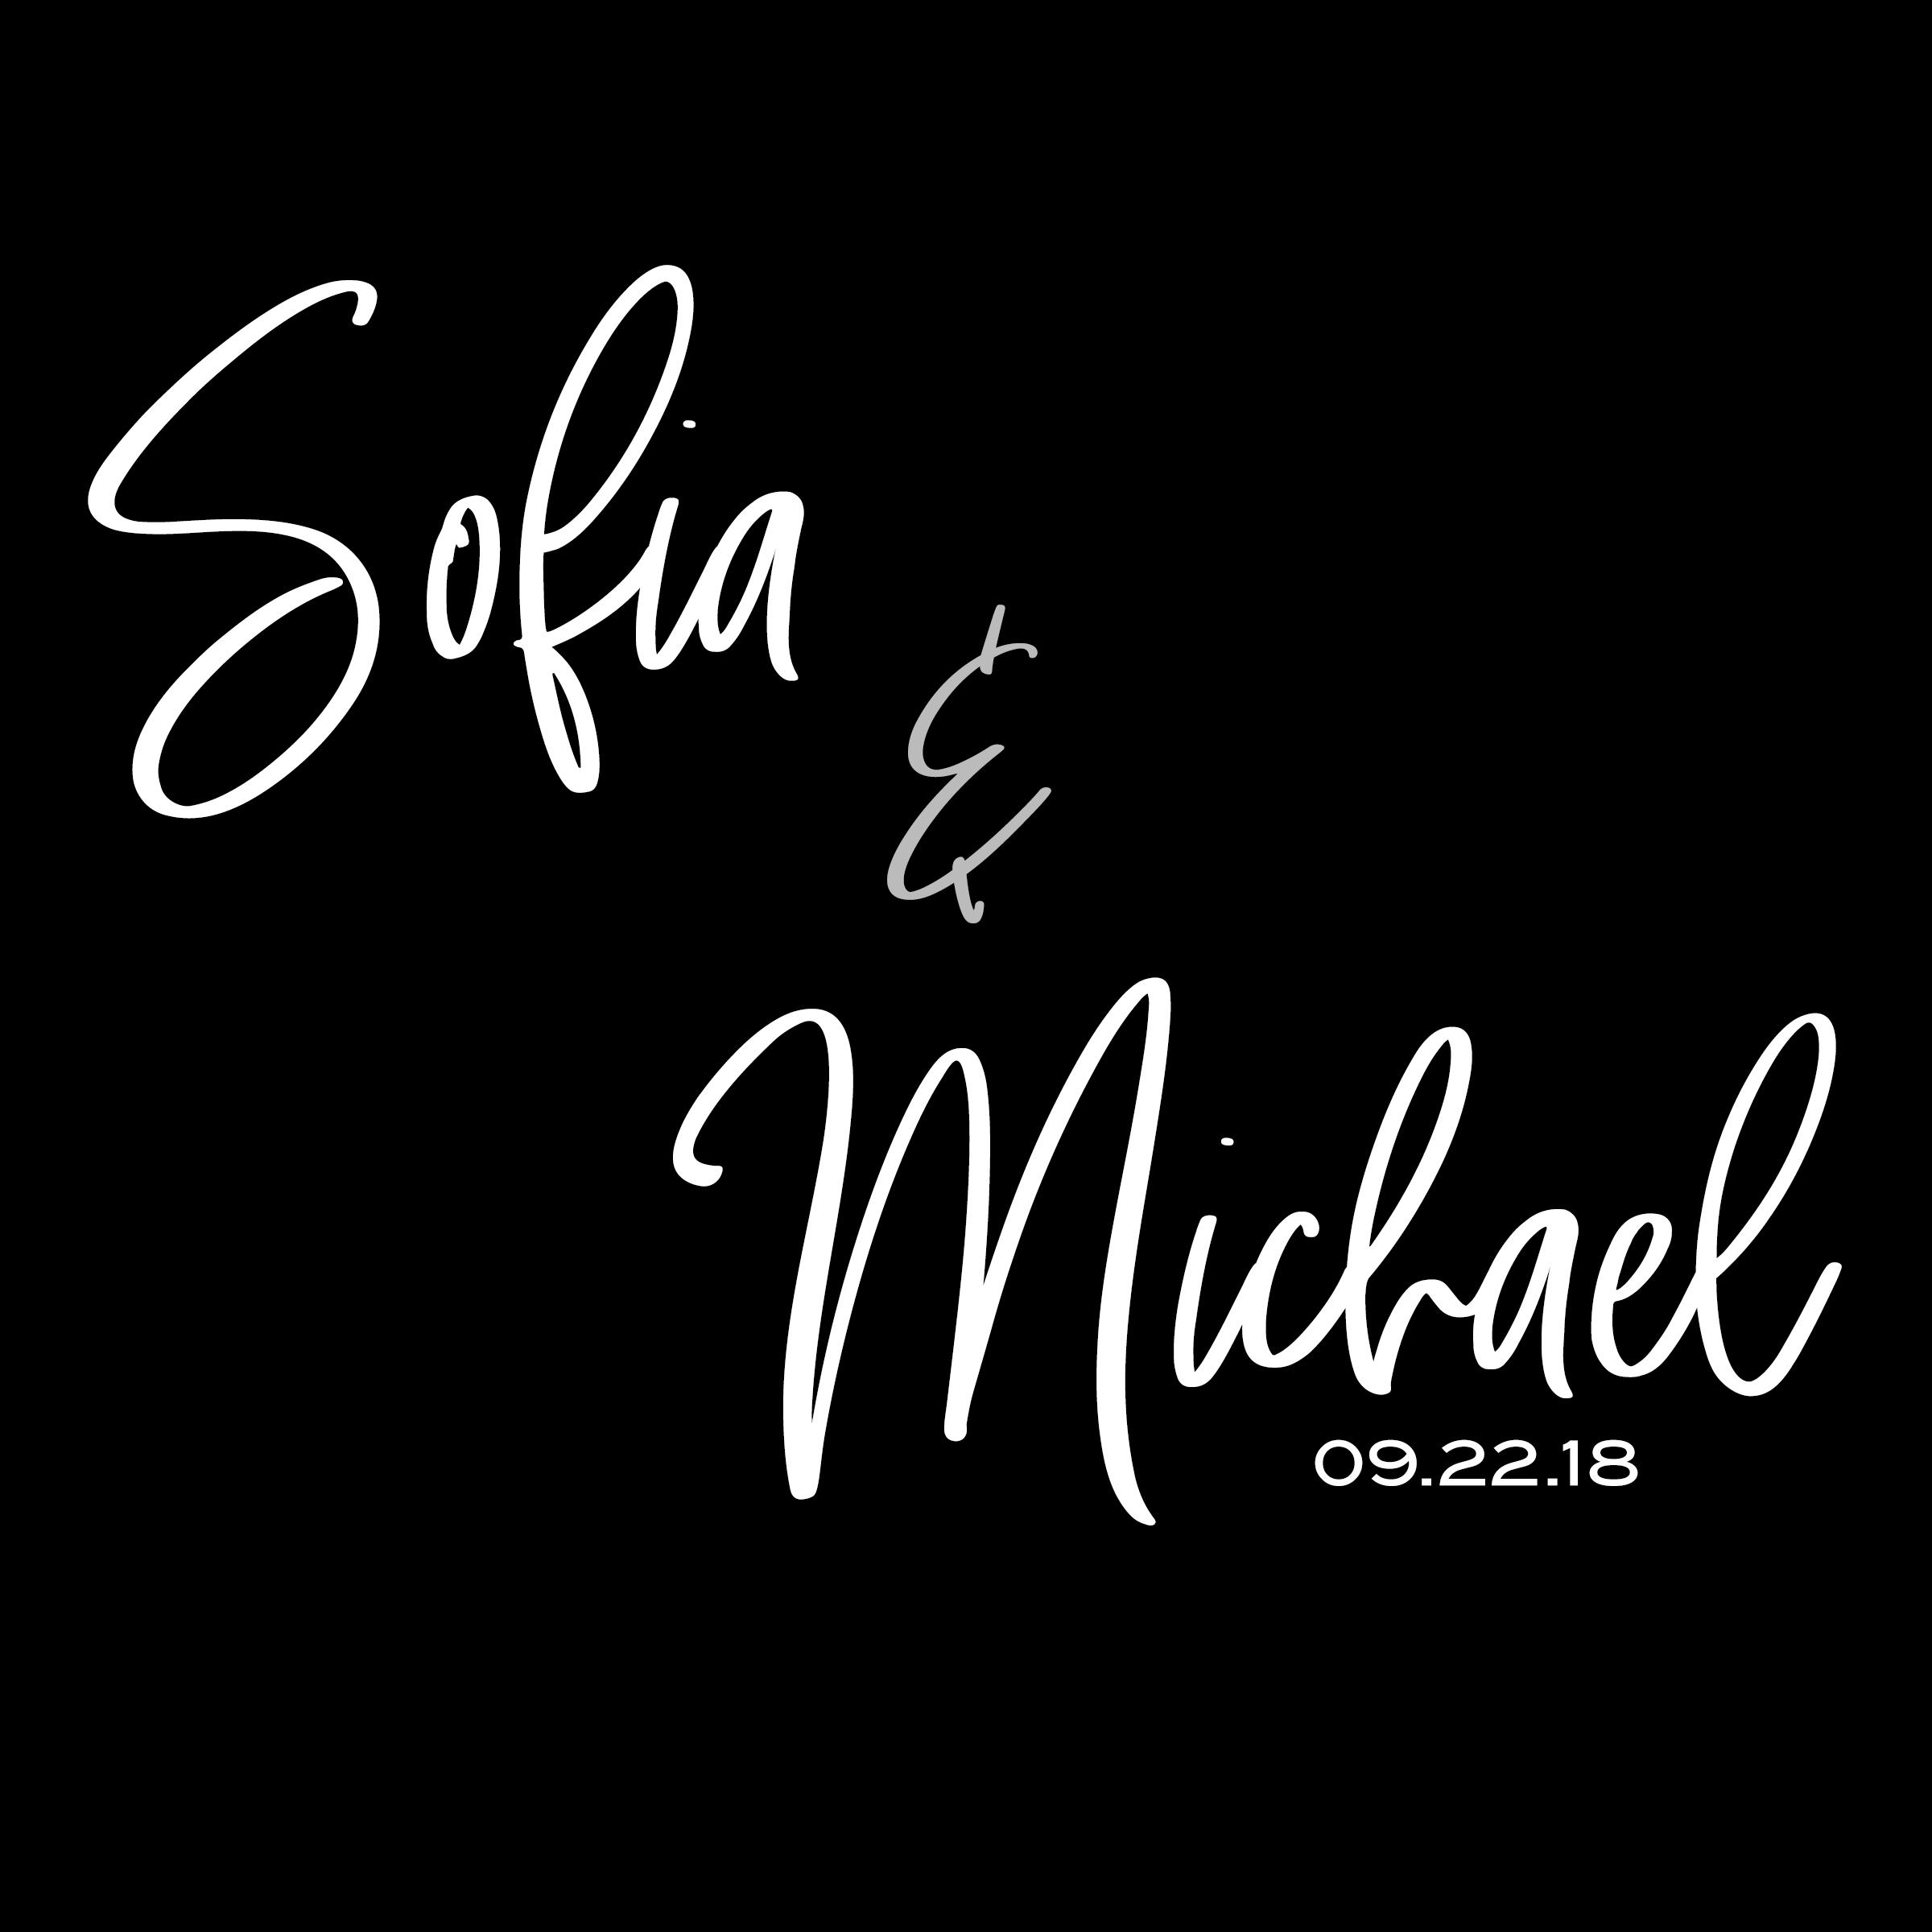 Sofia Michael 092218 Projector.jpg